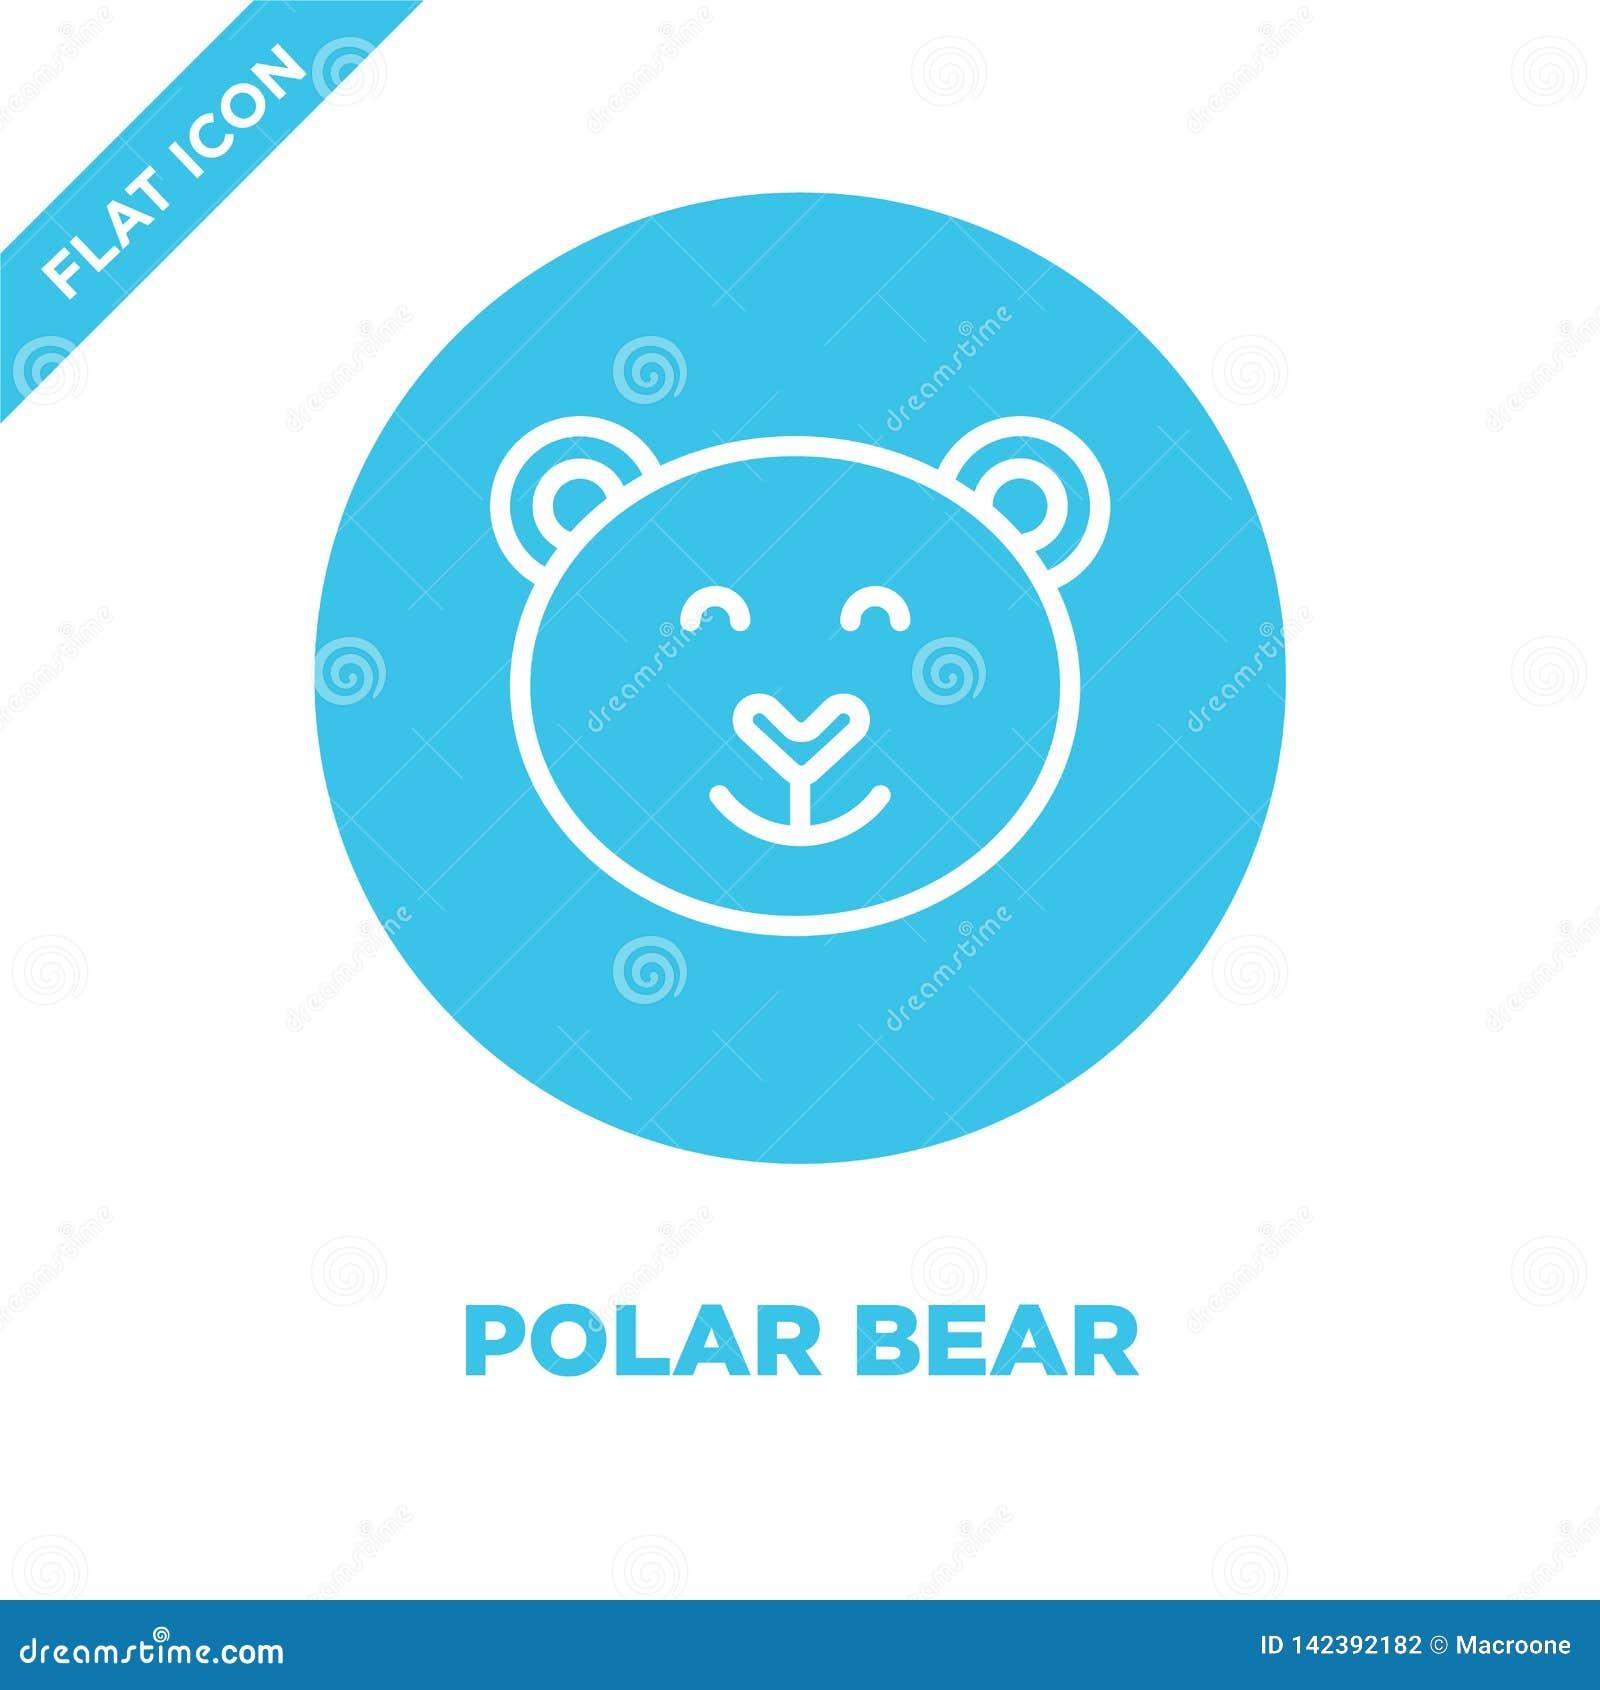 polar bear icon vector from seasons collection. Thin line polar bear outline icon vector  illustration. Linear symbol for use on